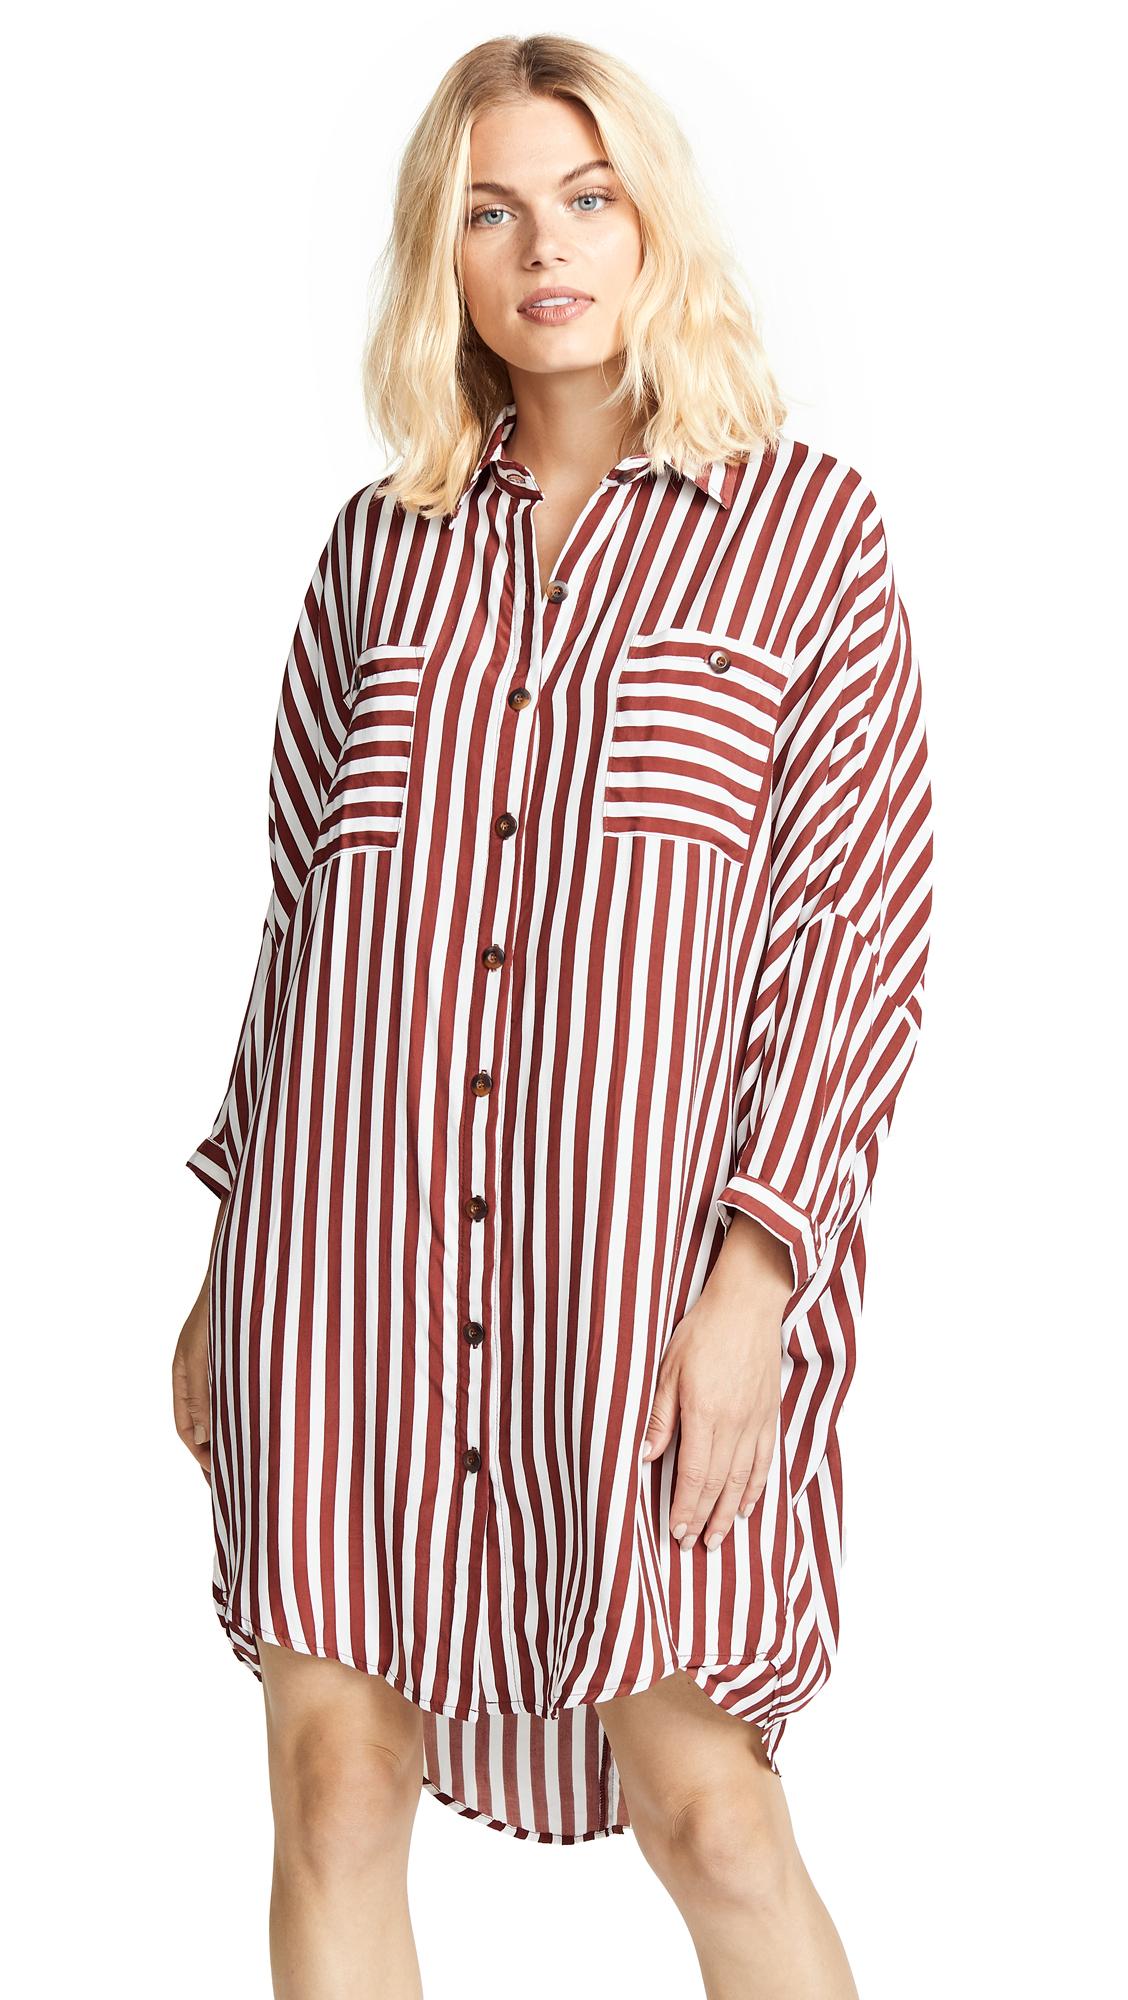 SPENCER SHIRT DRESS